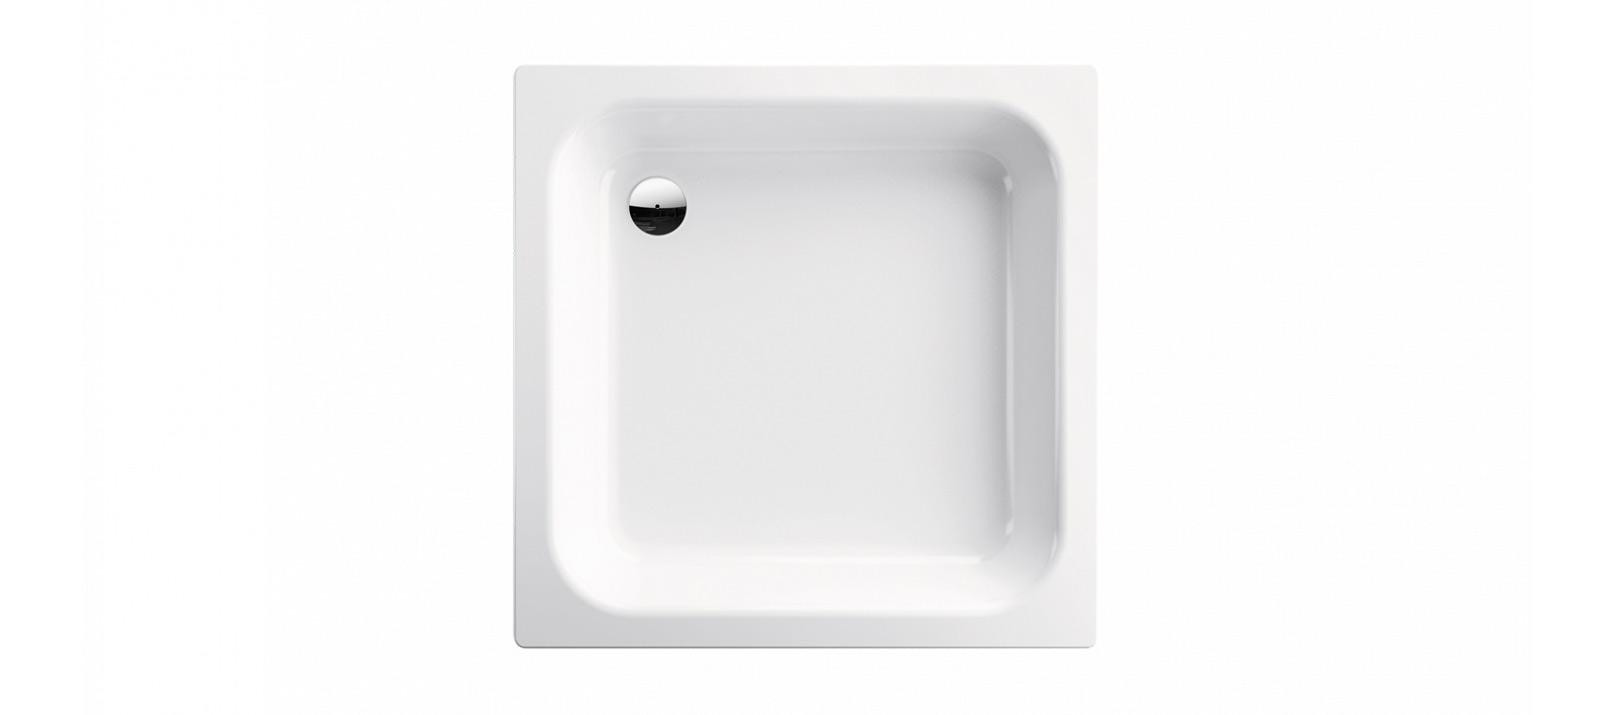 schmidlin receveur de douche profond 15 cm. Black Bedroom Furniture Sets. Home Design Ideas